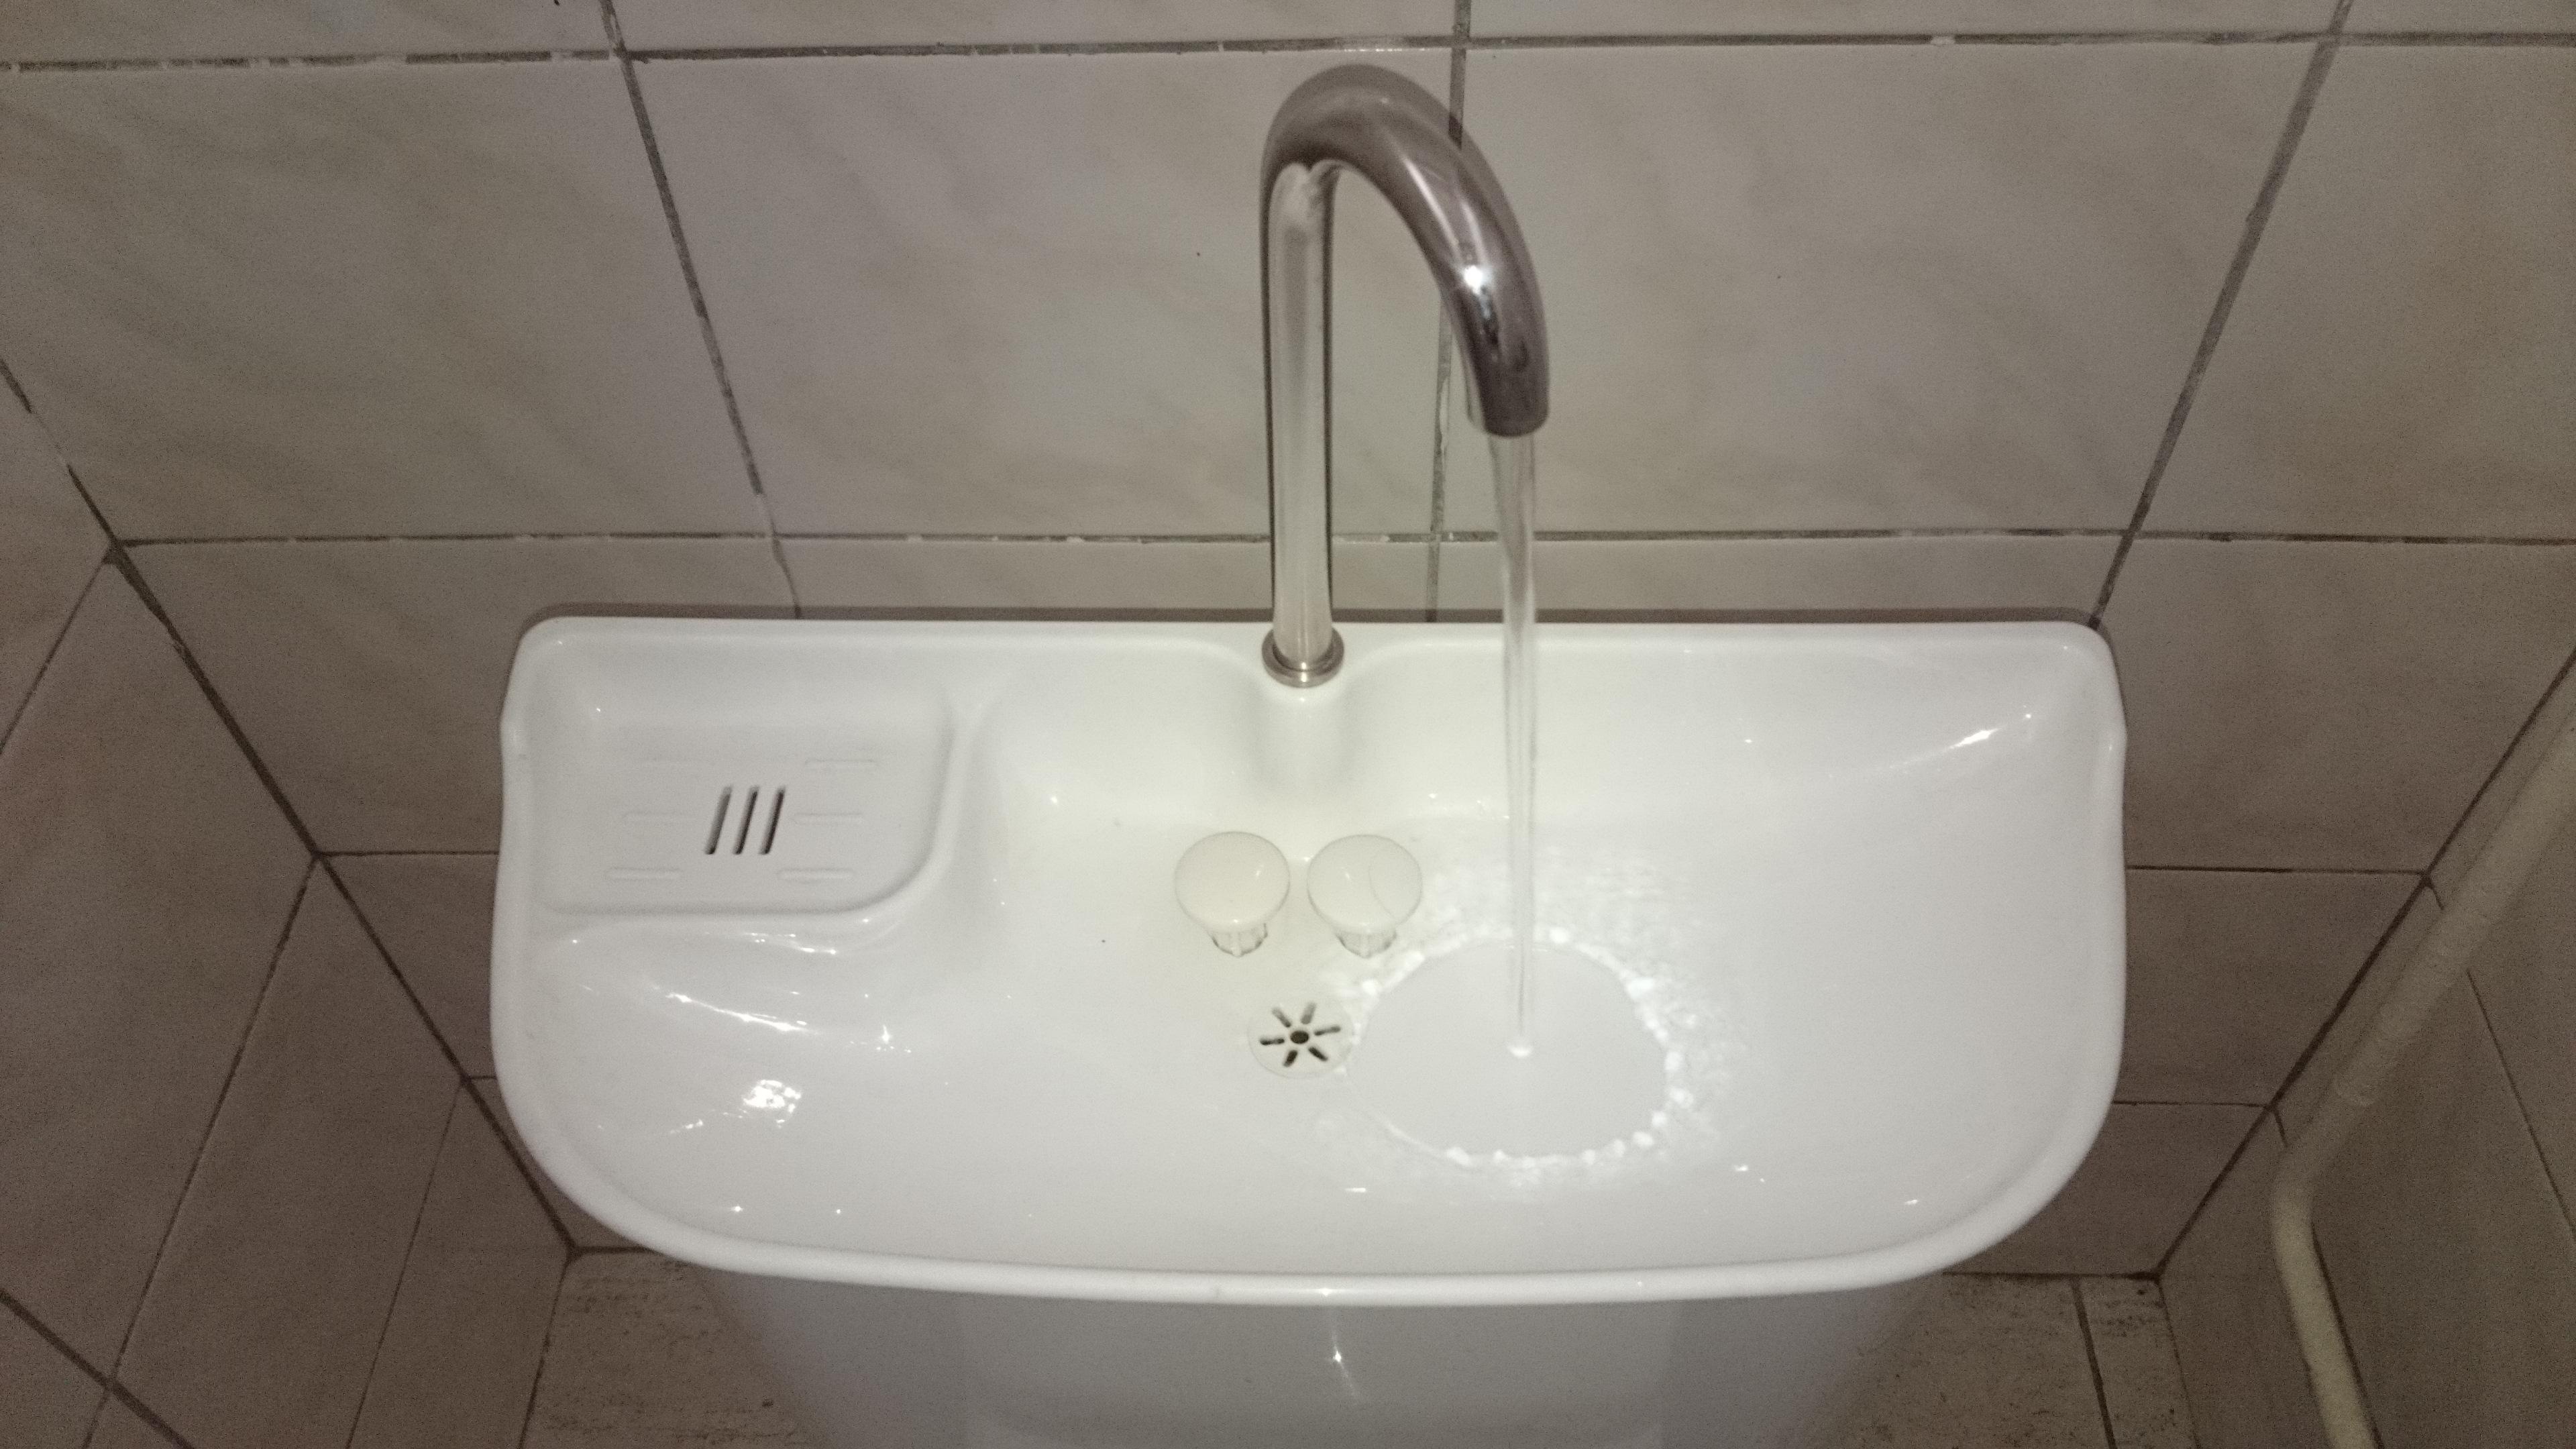 úsporny splachovač s wc